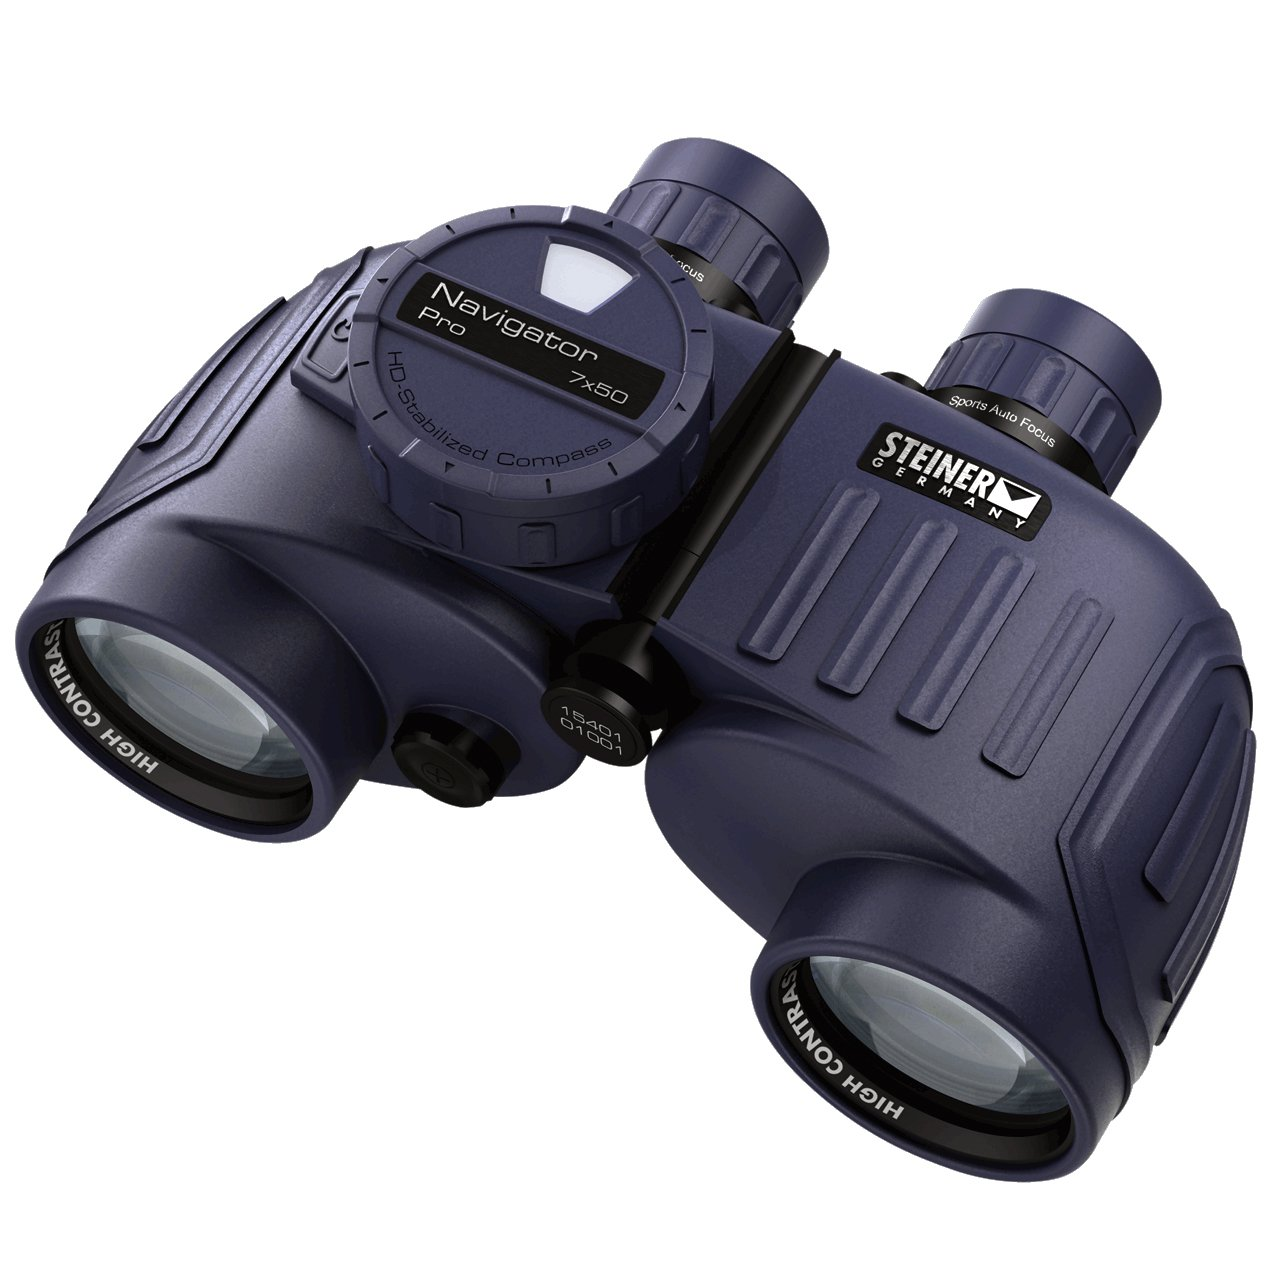 STEINER(シュタイナー) 双眼鏡 ナビゲーターPro 7×50 コンパス 7155 【日本正規品】 B00PRG0B1K